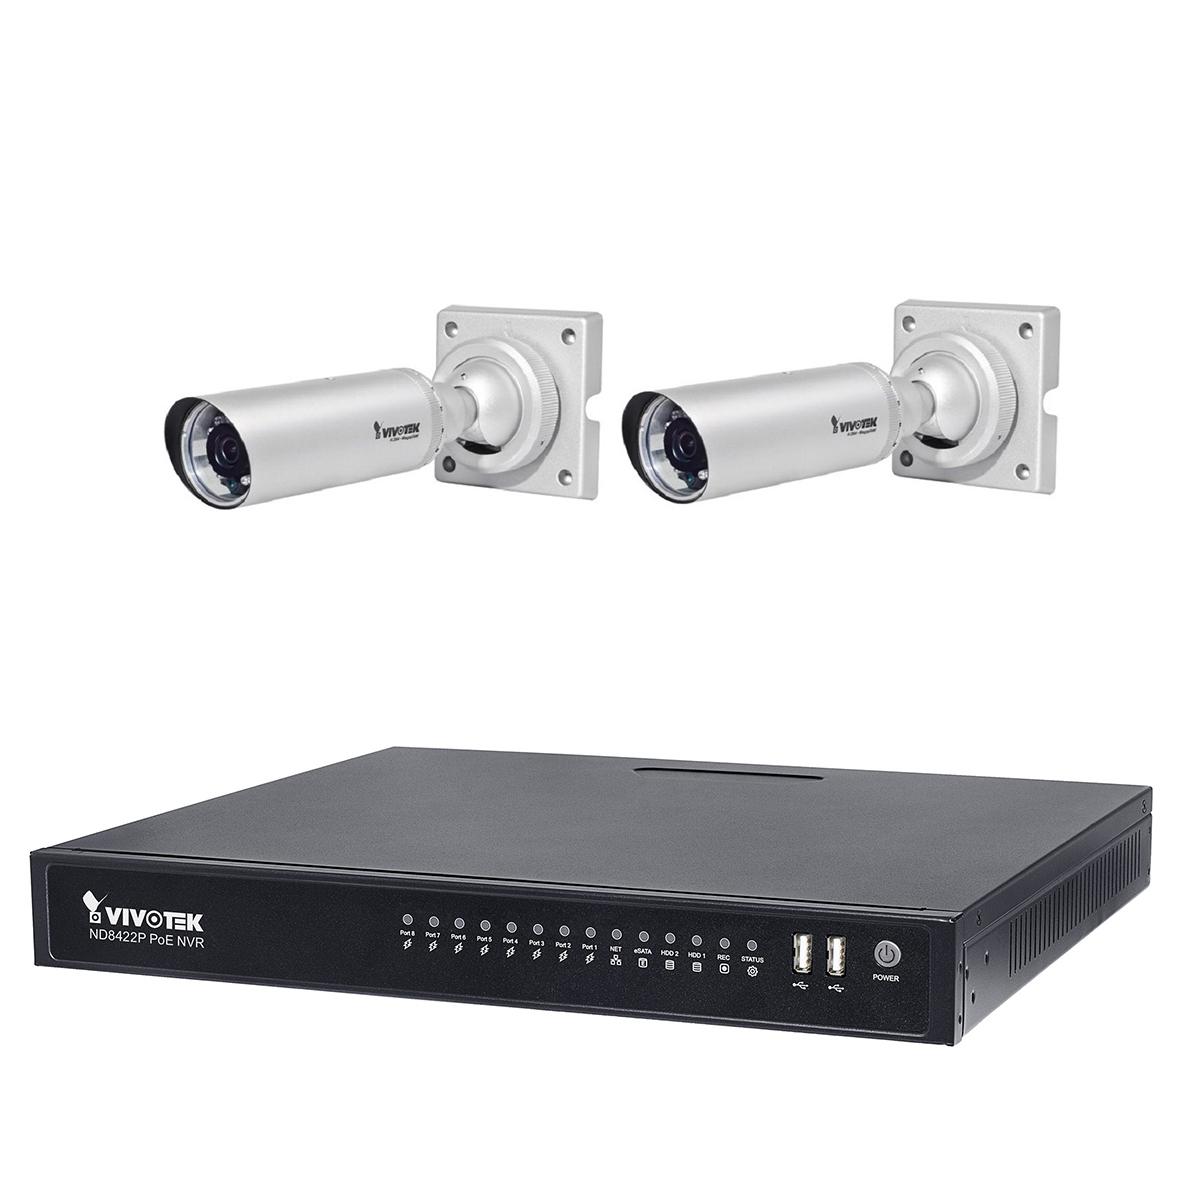 سیستم امنیتی ویوتک مدل ND8422P/IB8354Cx2 Solution Kit